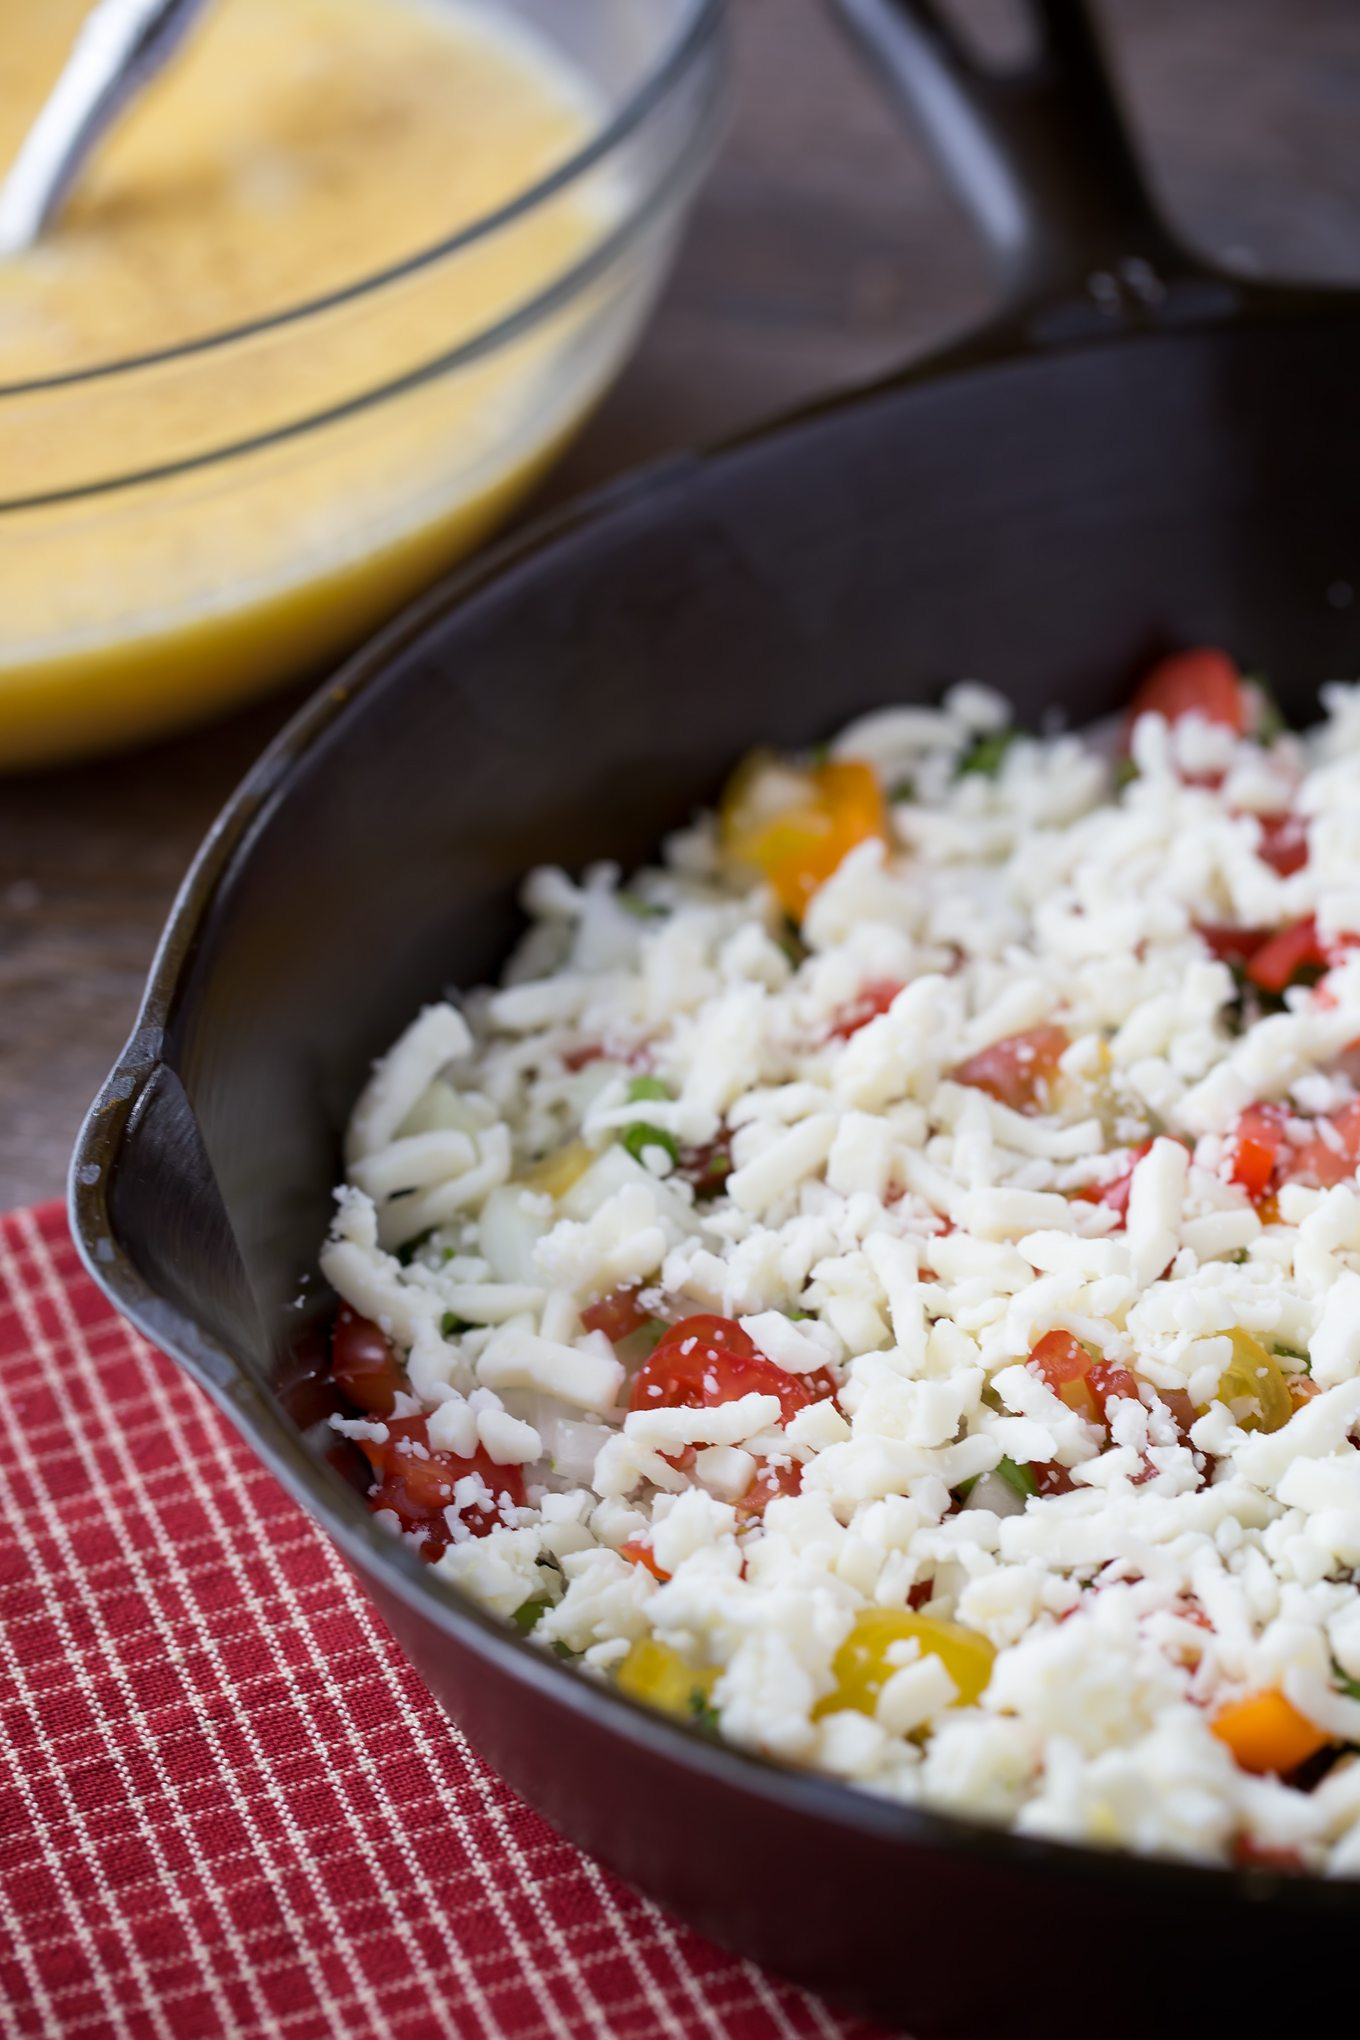 Cheese and Fresh Vegetables for Vegetarian Egg Bake Recipe